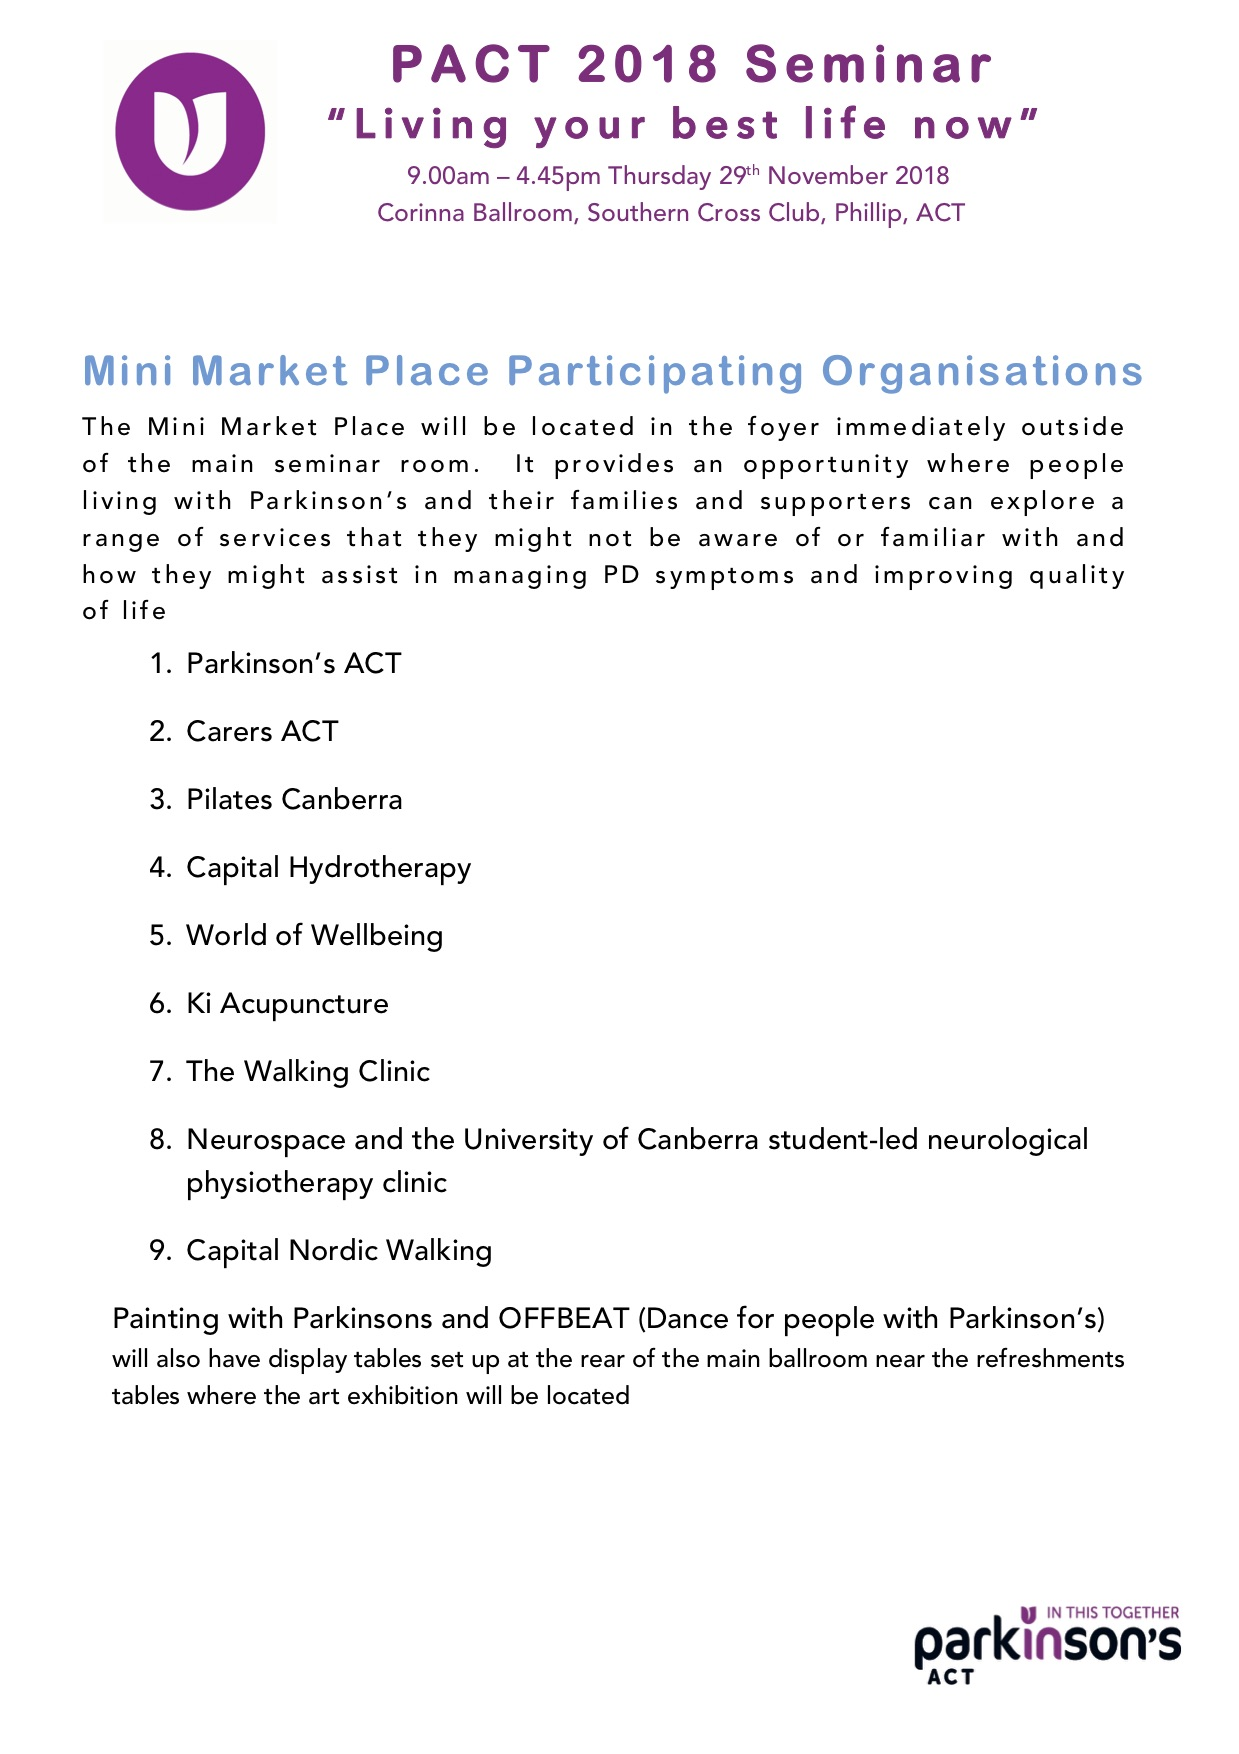 MiniMarket List